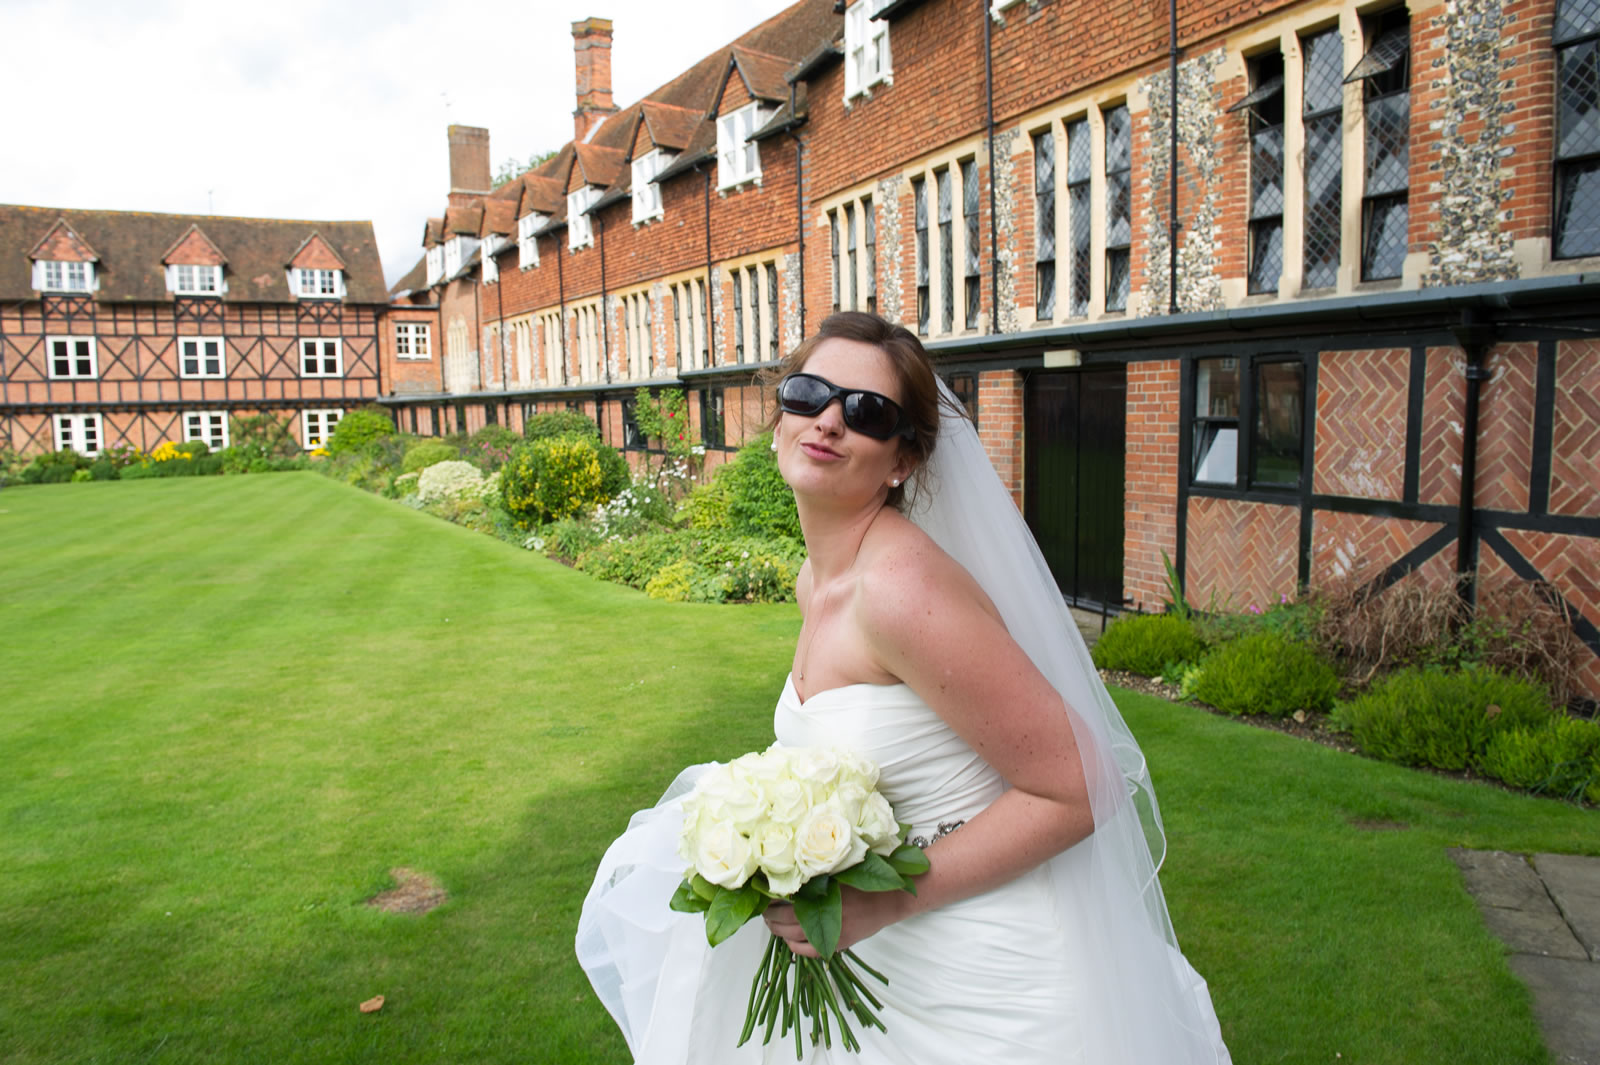 Wedding Hair Makeup For Brides Bridesmaids Mothers In Berkshire Surrey Surrounding